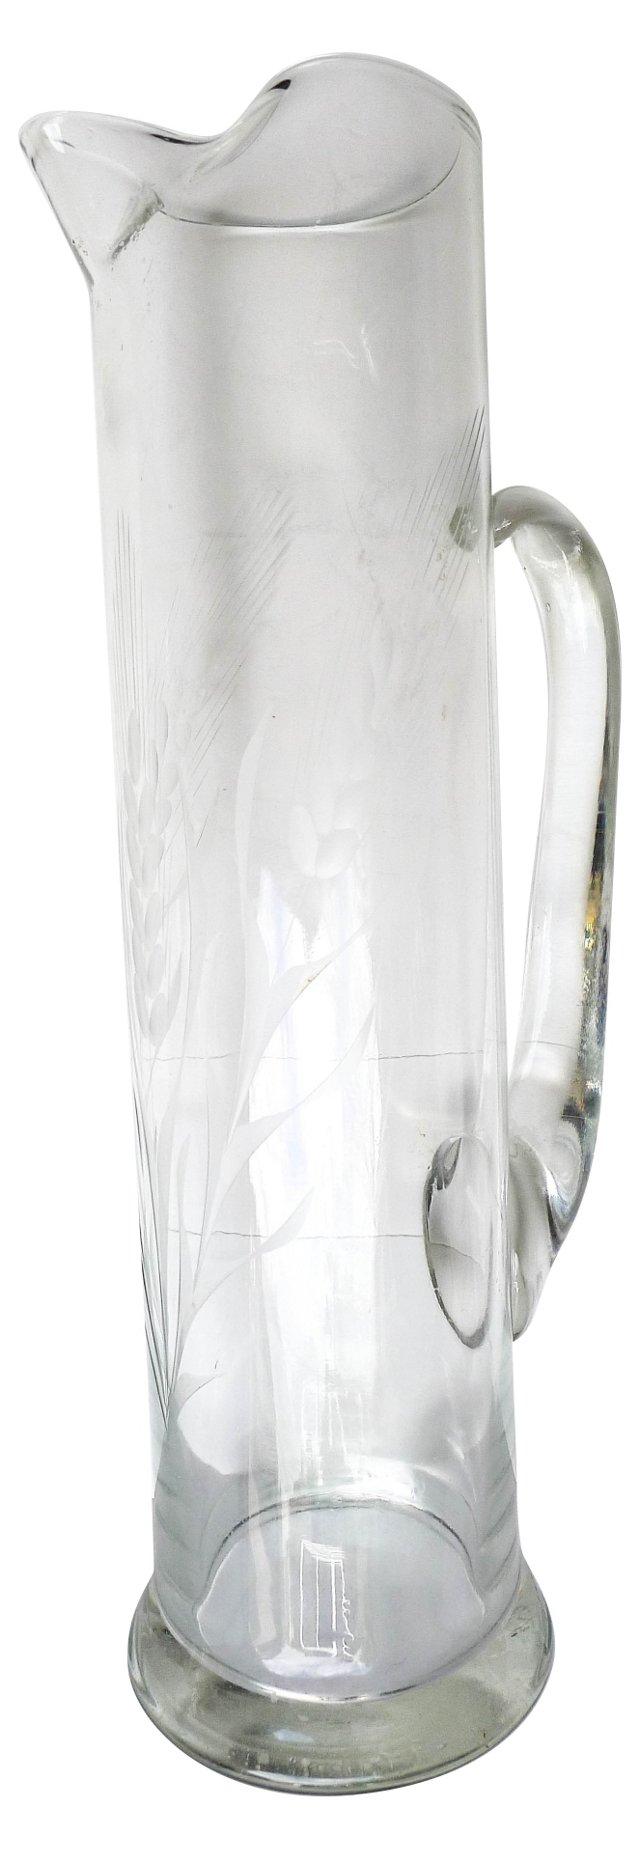 Glass Carafe Pitcher